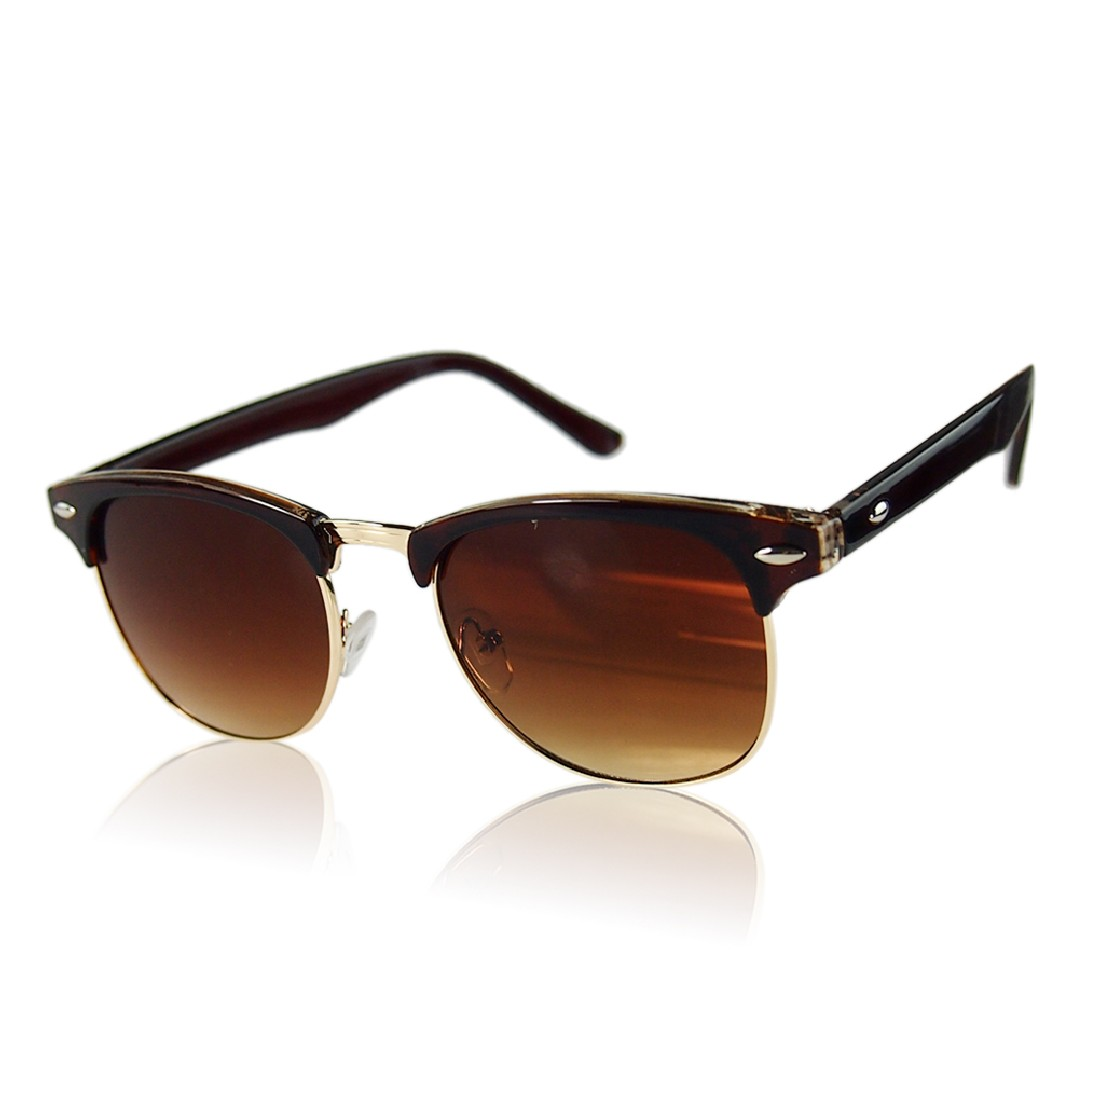 c83a99135 2016 nova moda Metade Quadro Semi-Sem Aro Óculos Oversized Óculos de Sol  Clássico Retro Vintage de Metal Unisex